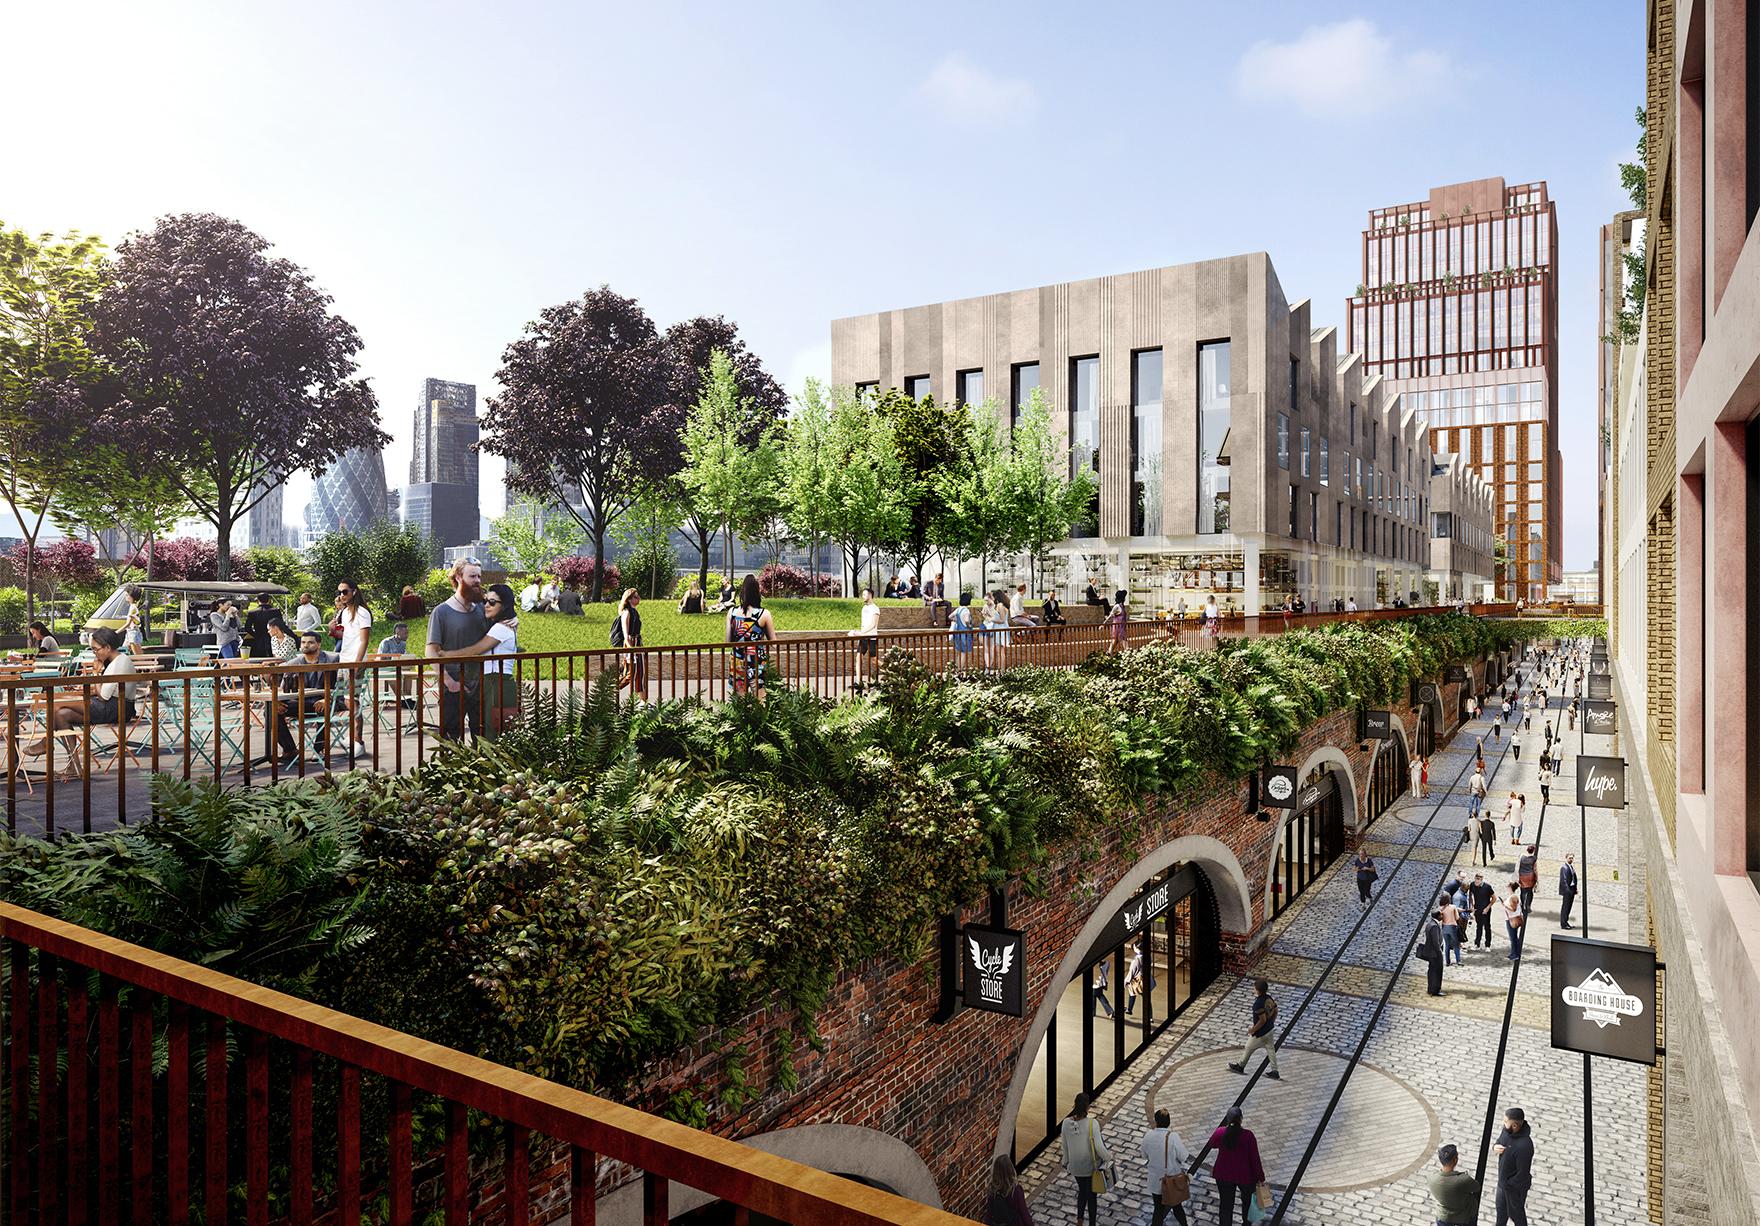 Bishopsgate Goodsyard Shoreditch London Mixed Use Masterplan Arches In Daylight Lh